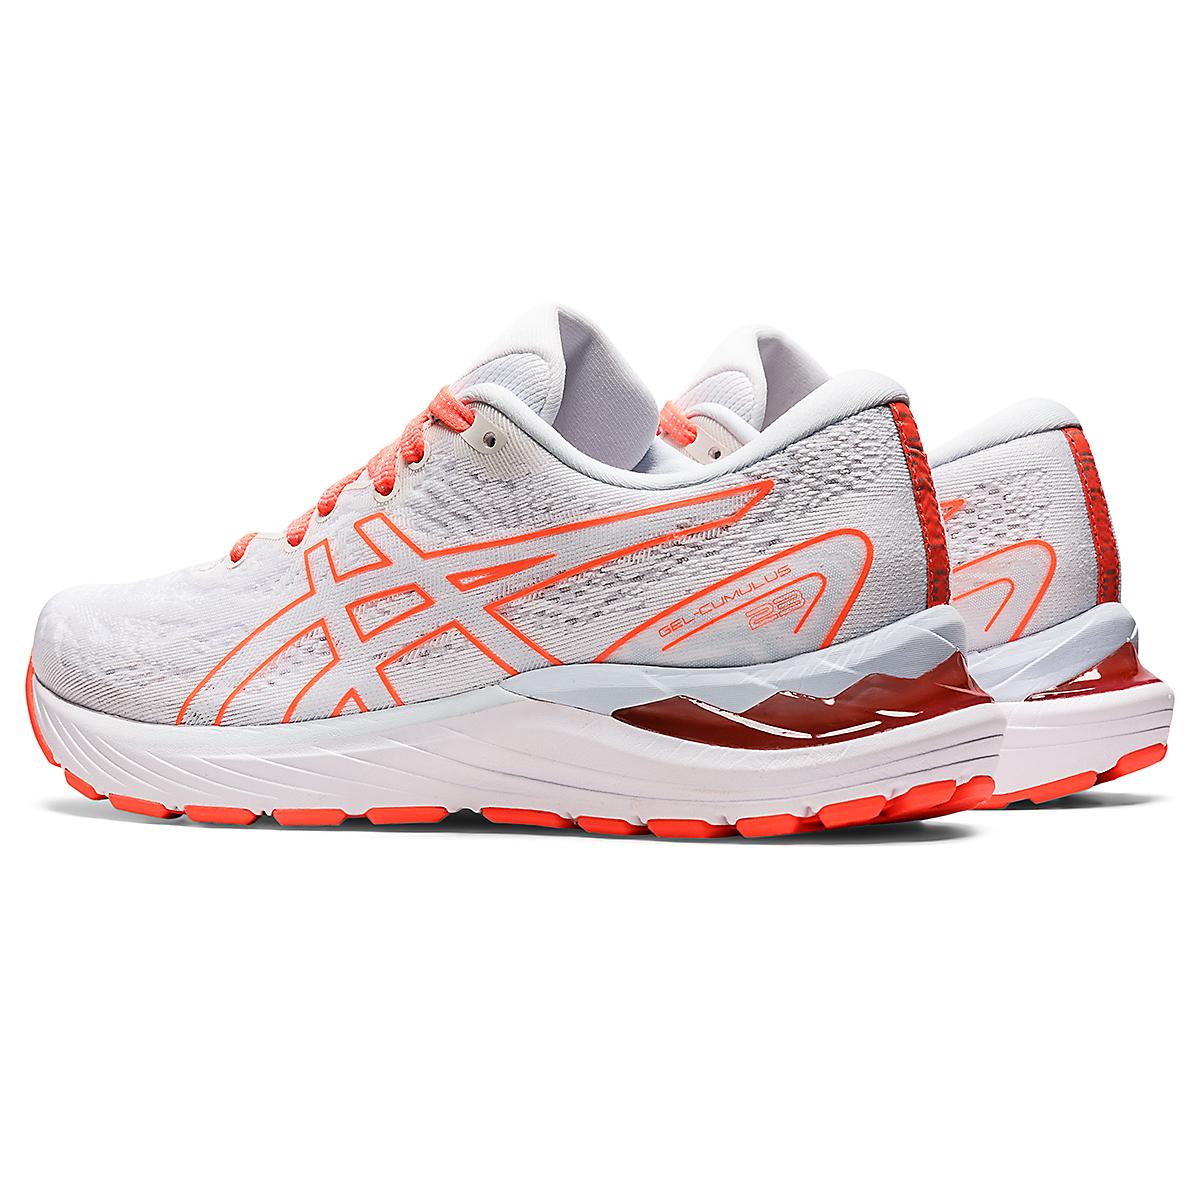 Women's Asics Gel-Cumulus 23 Running Shoe - Color: White/Sky - JackRabbit Exclusive - Size: 5 - Width: Regular, White/Sky - JackRabbit Exclusive, large, image 4